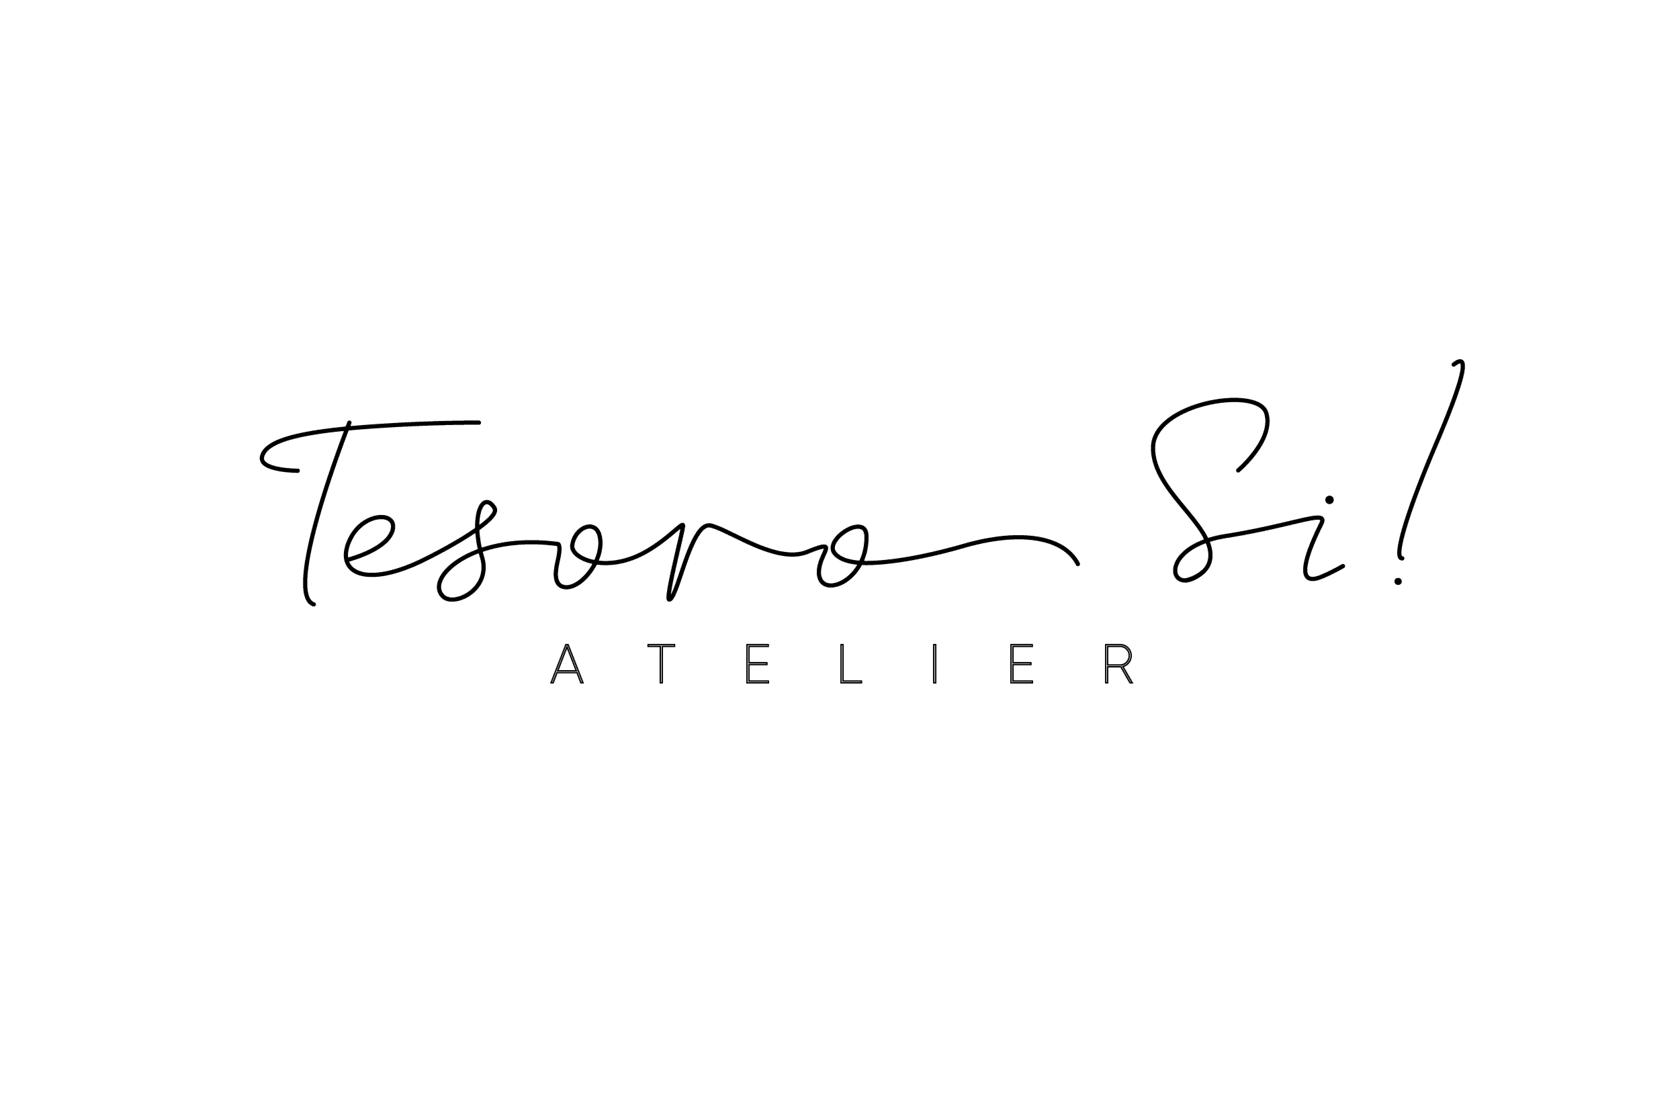 Ślubne Atelier Tesoro